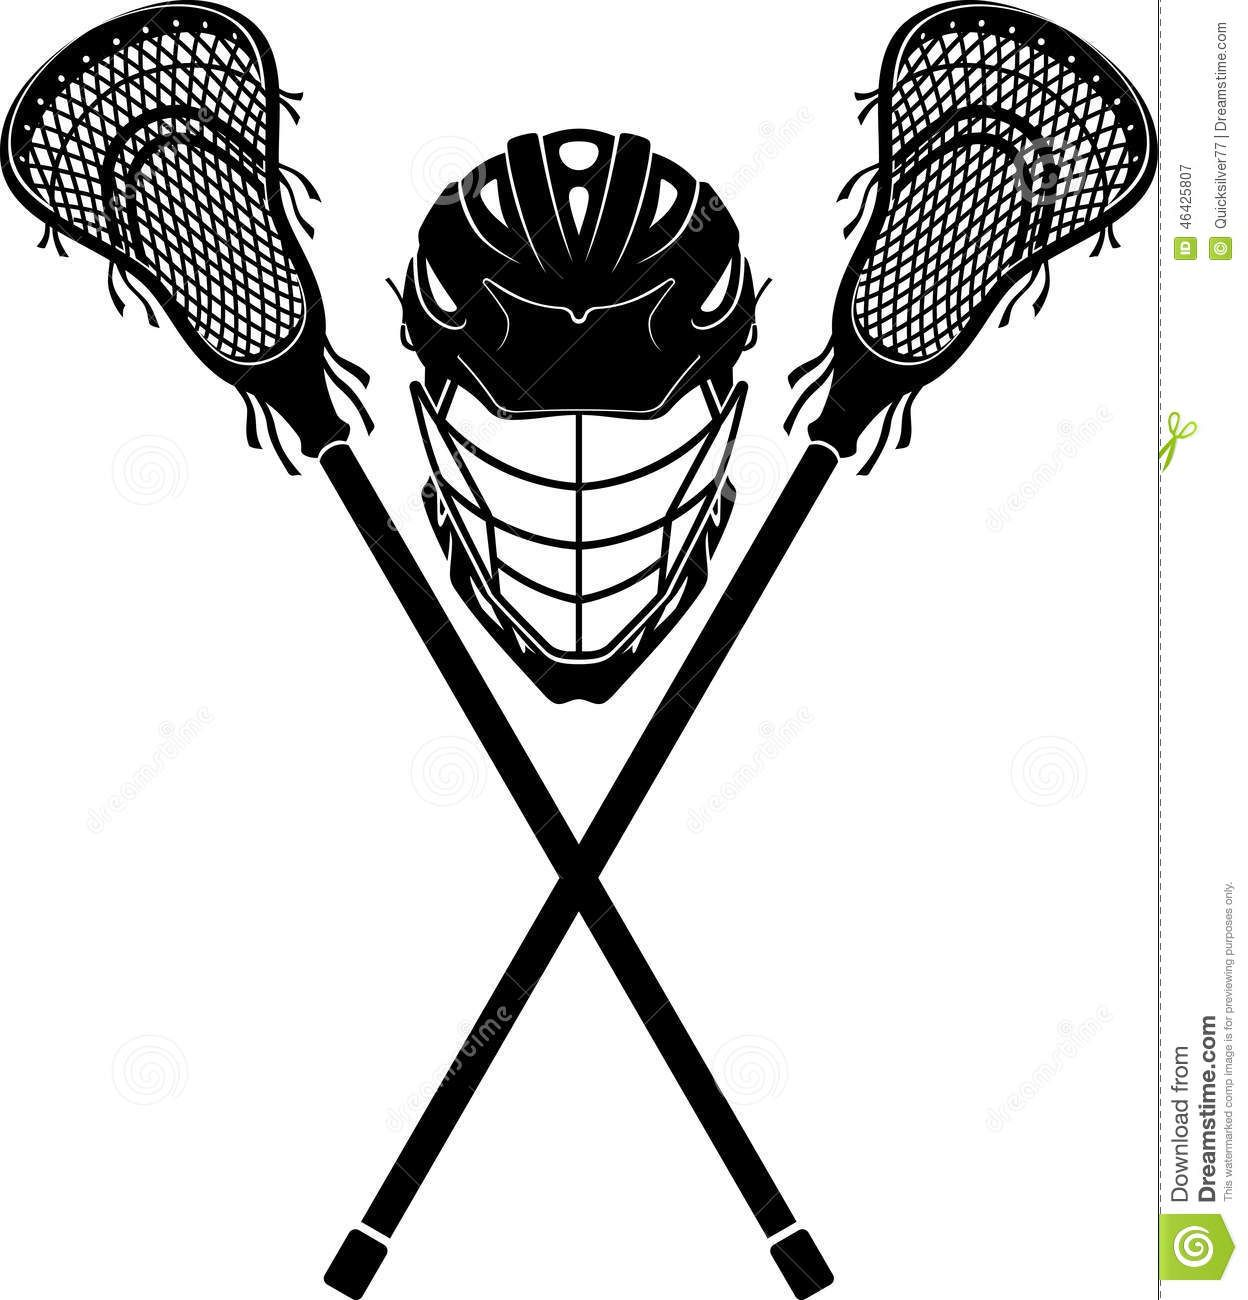 small resolution of la crosse silhouette clip art silhouette projects lacrosse sport sports equipment